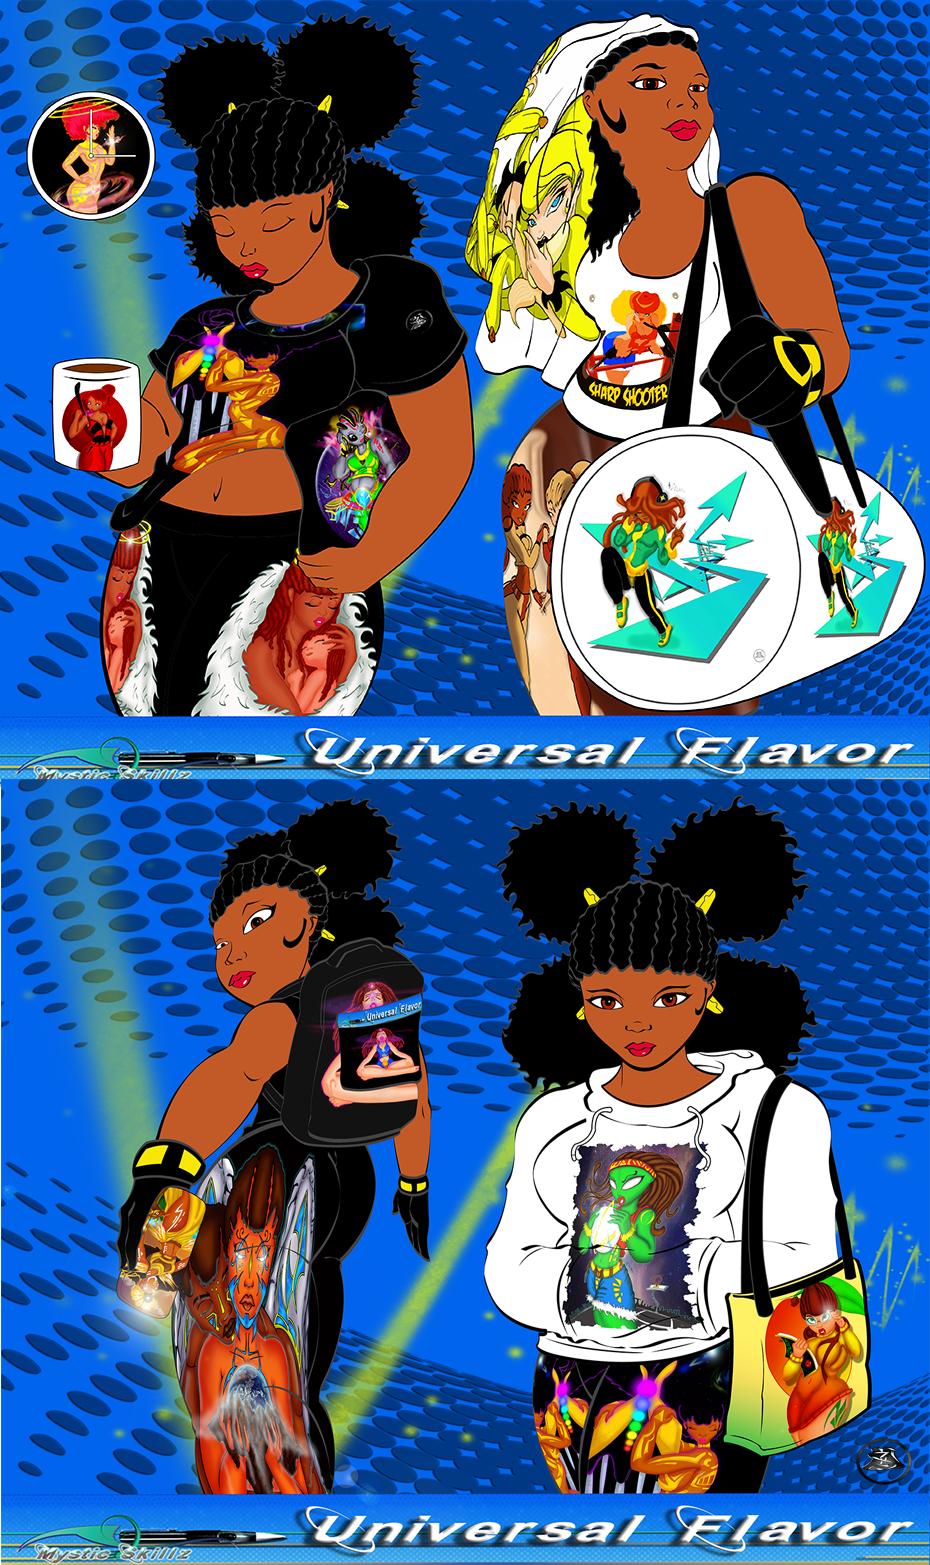 Universal Flavor